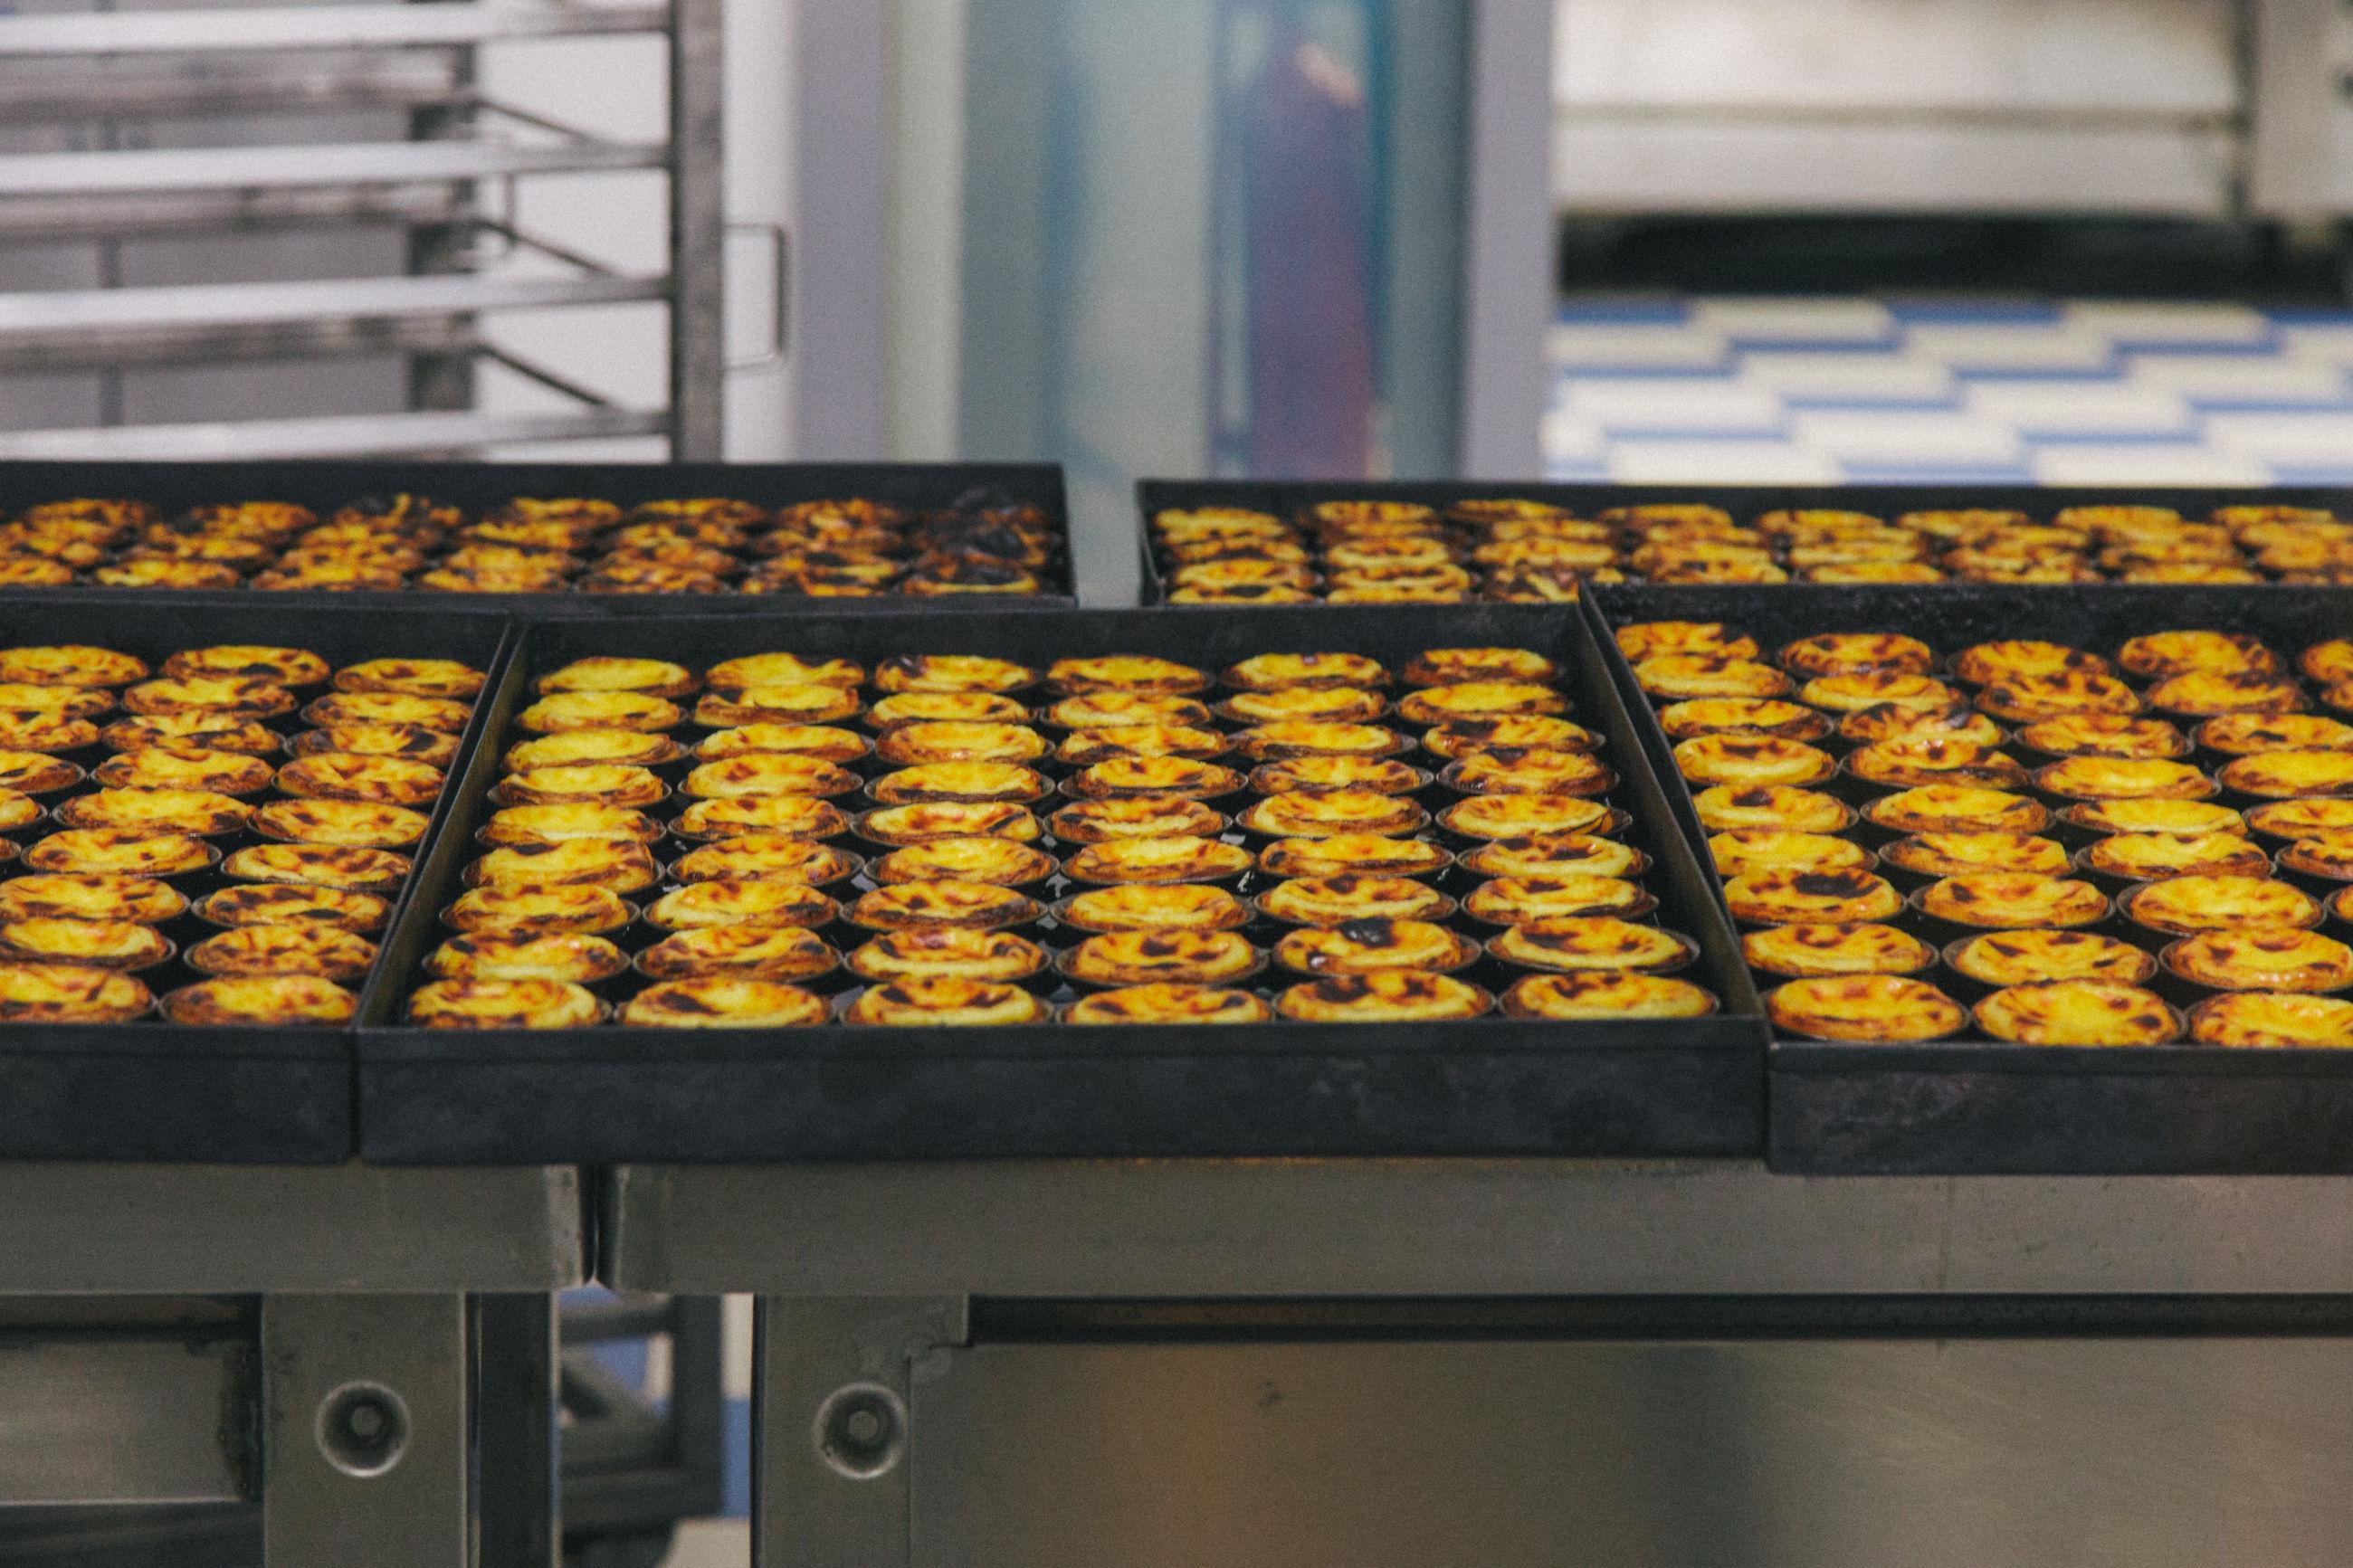 Full frame shot of food in baking sheets